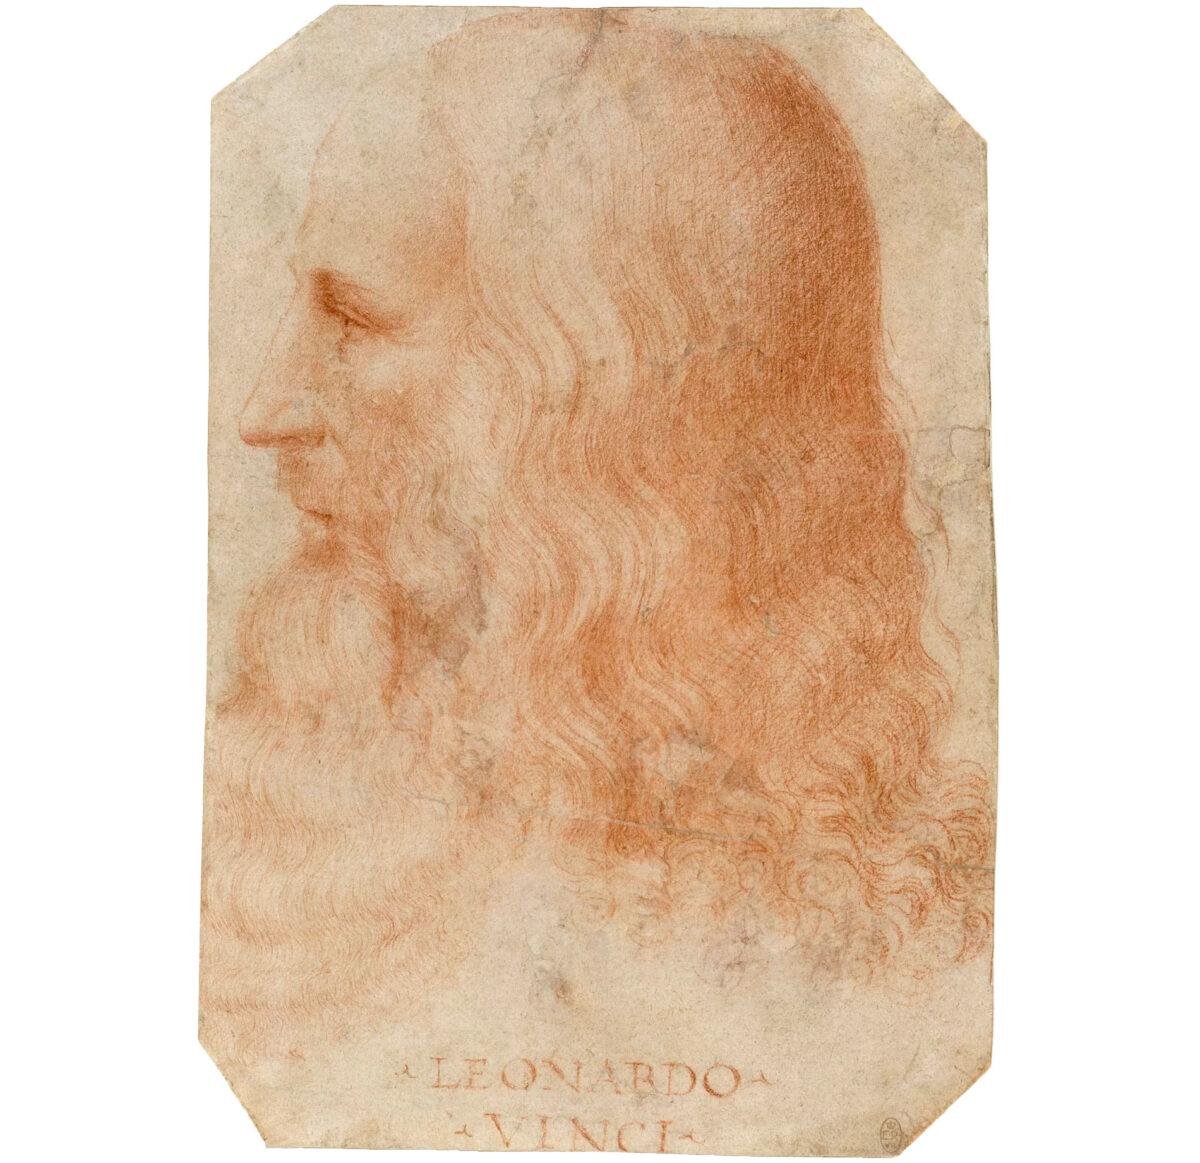 Portrait of Leonardo da Vinci attributed to Francesco Melzi circa 1515-1518 (photo: Wikipedia).